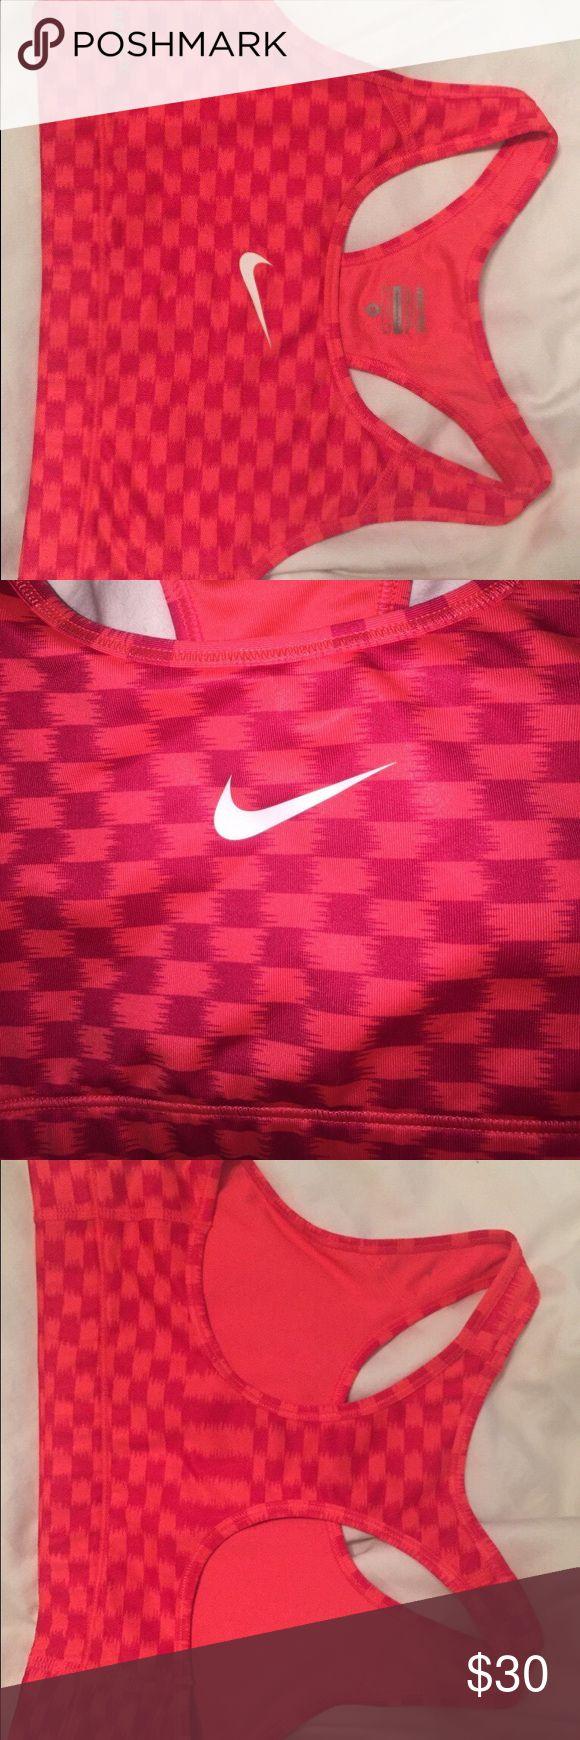 nike patterned sports bra Worn 1x perfect condition size medium Nike Intimates & Sleepwear Bras